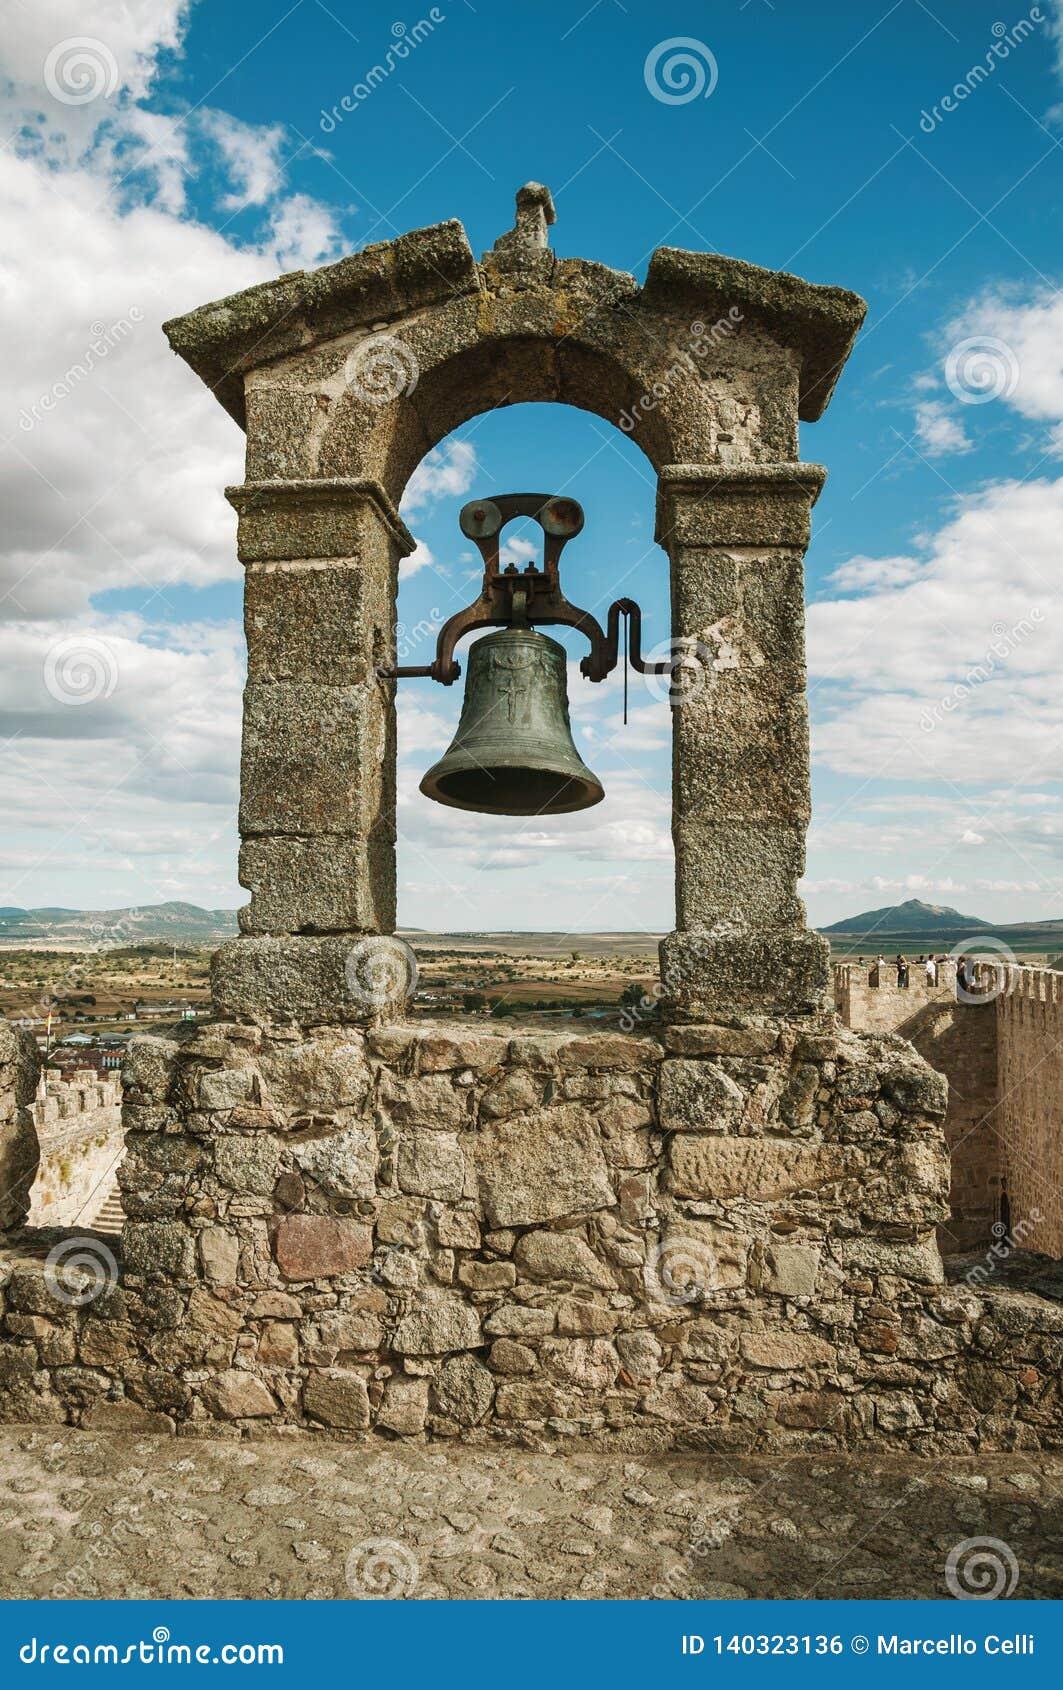 Bronsklok bovenop steenmuur bij het Kasteel van Trujillo